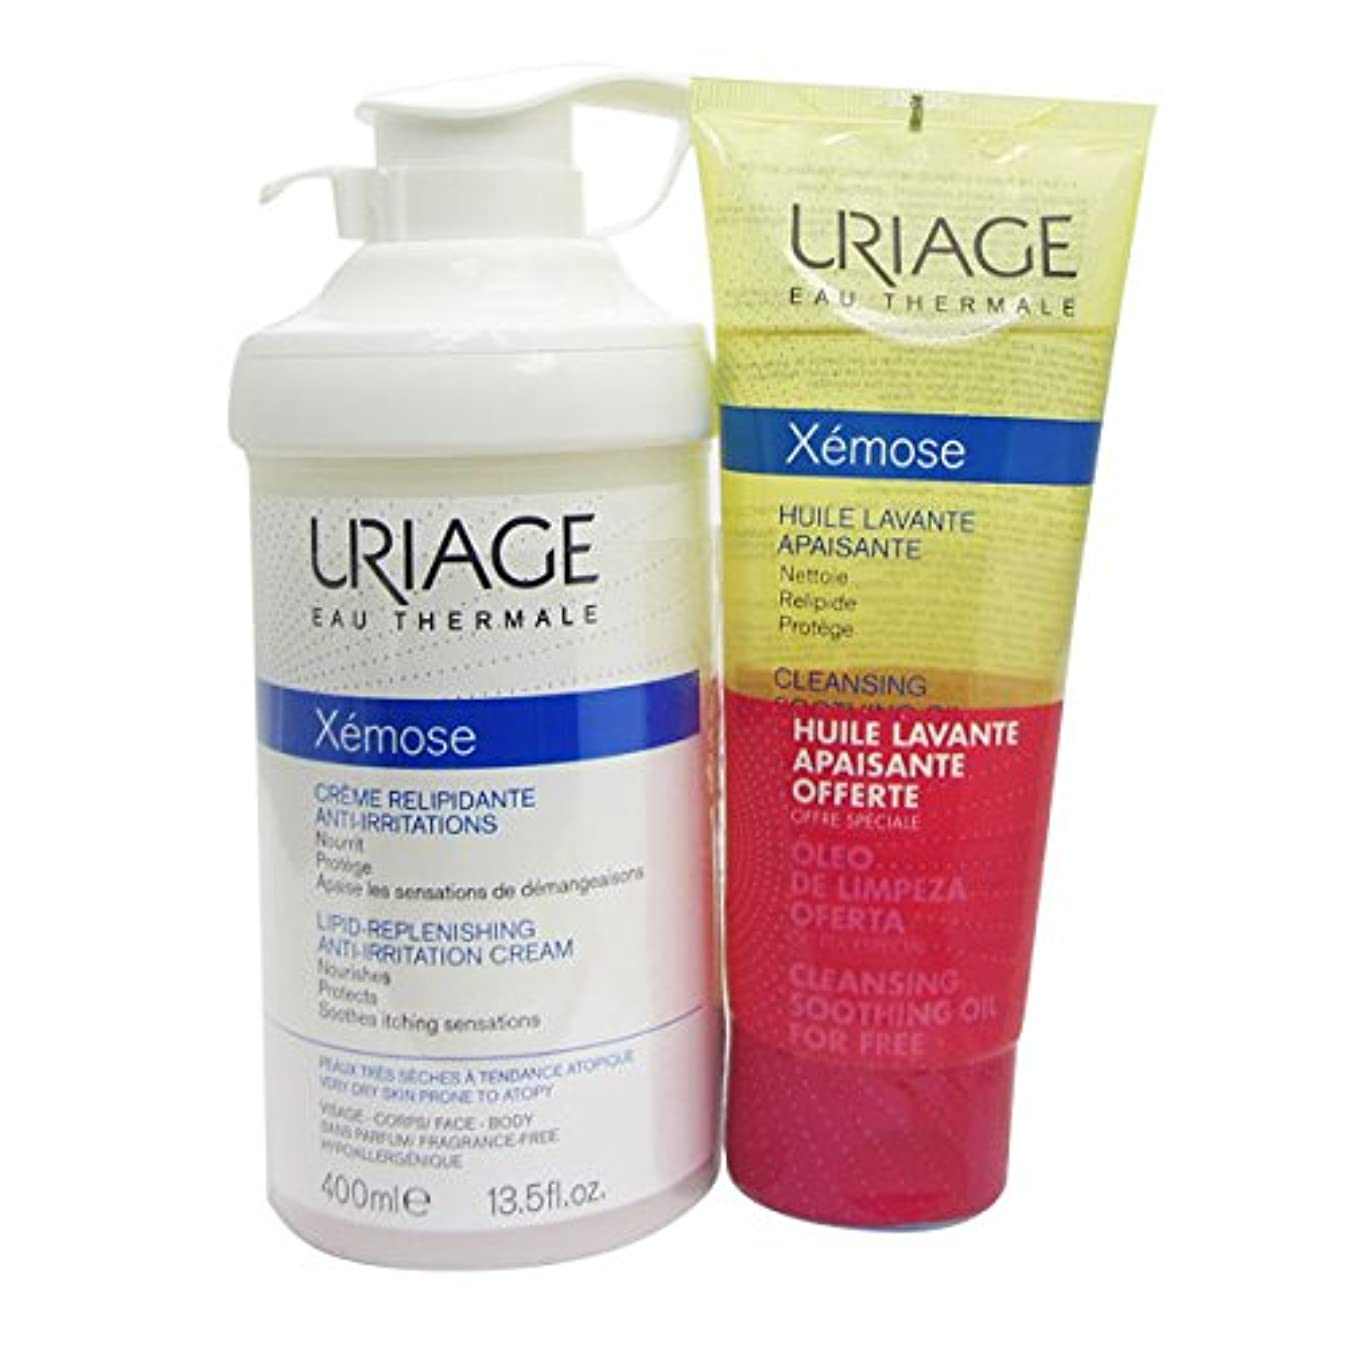 雑草入札突然Uriage Xémose Pack Universal Emollient Cream 400ml + Gift Cleansing Oil